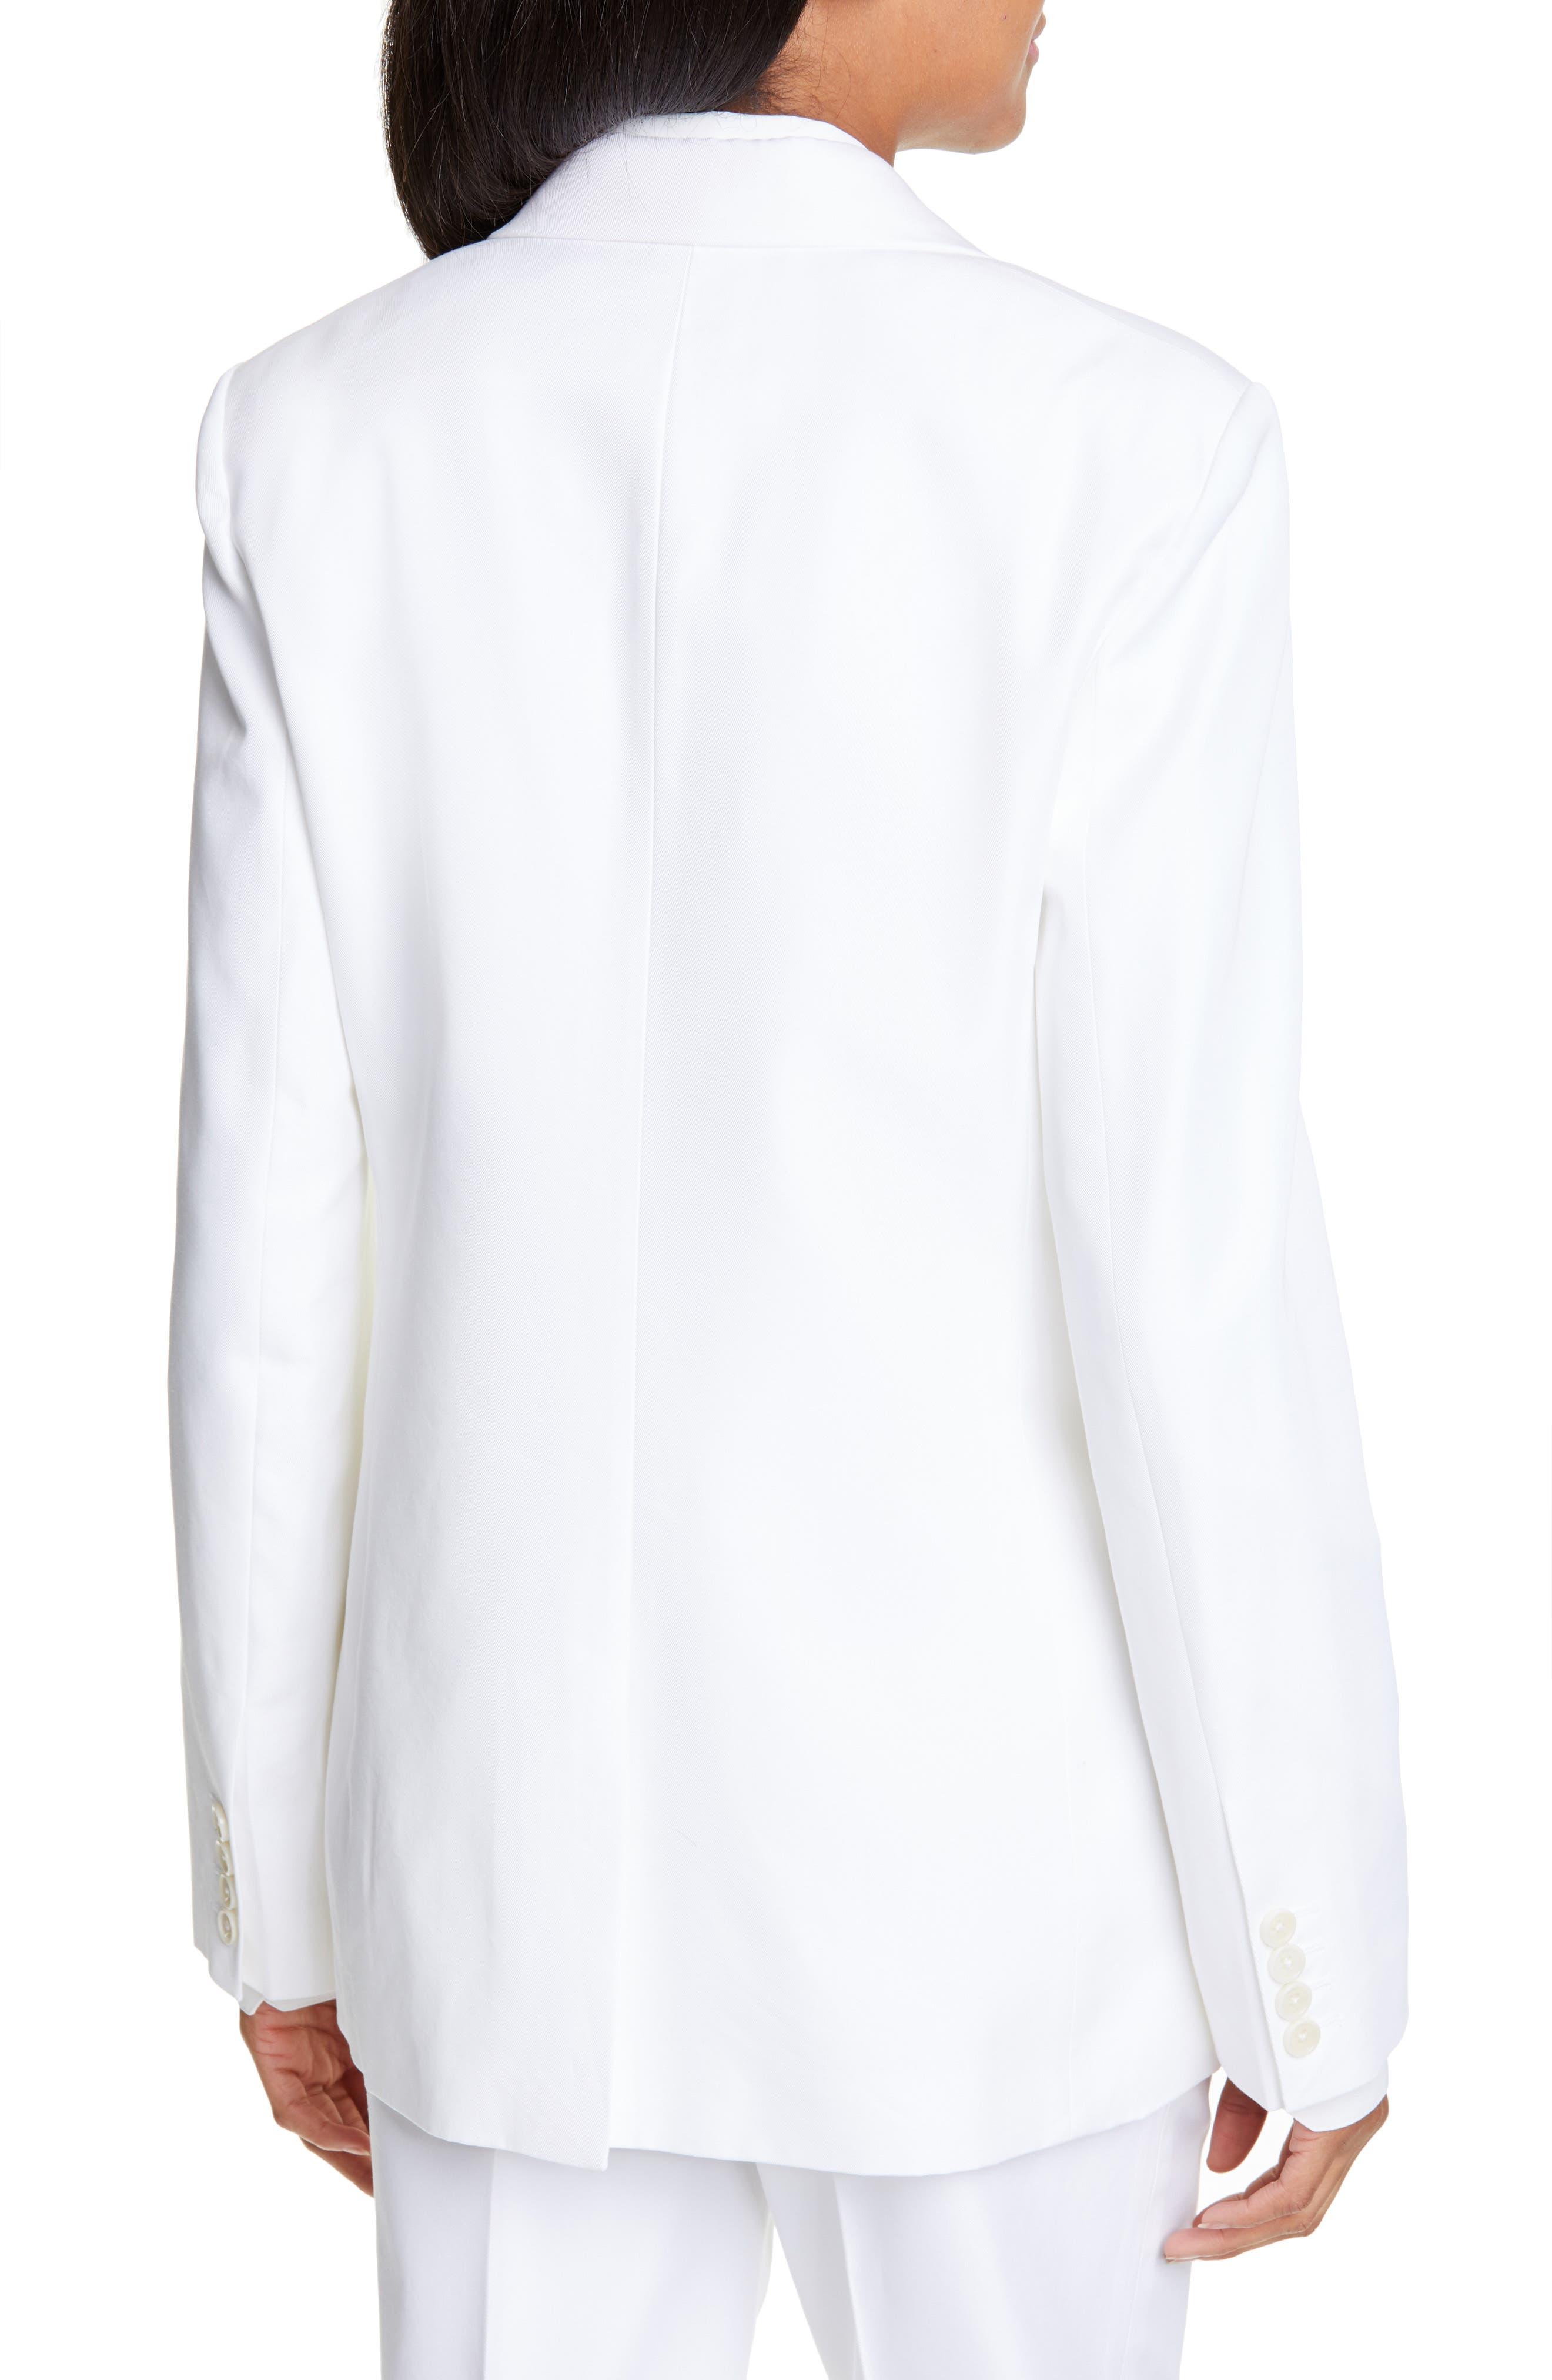 HELMUT LANG, Cotton Blend Blazer, Alternate thumbnail 2, color, WHITE